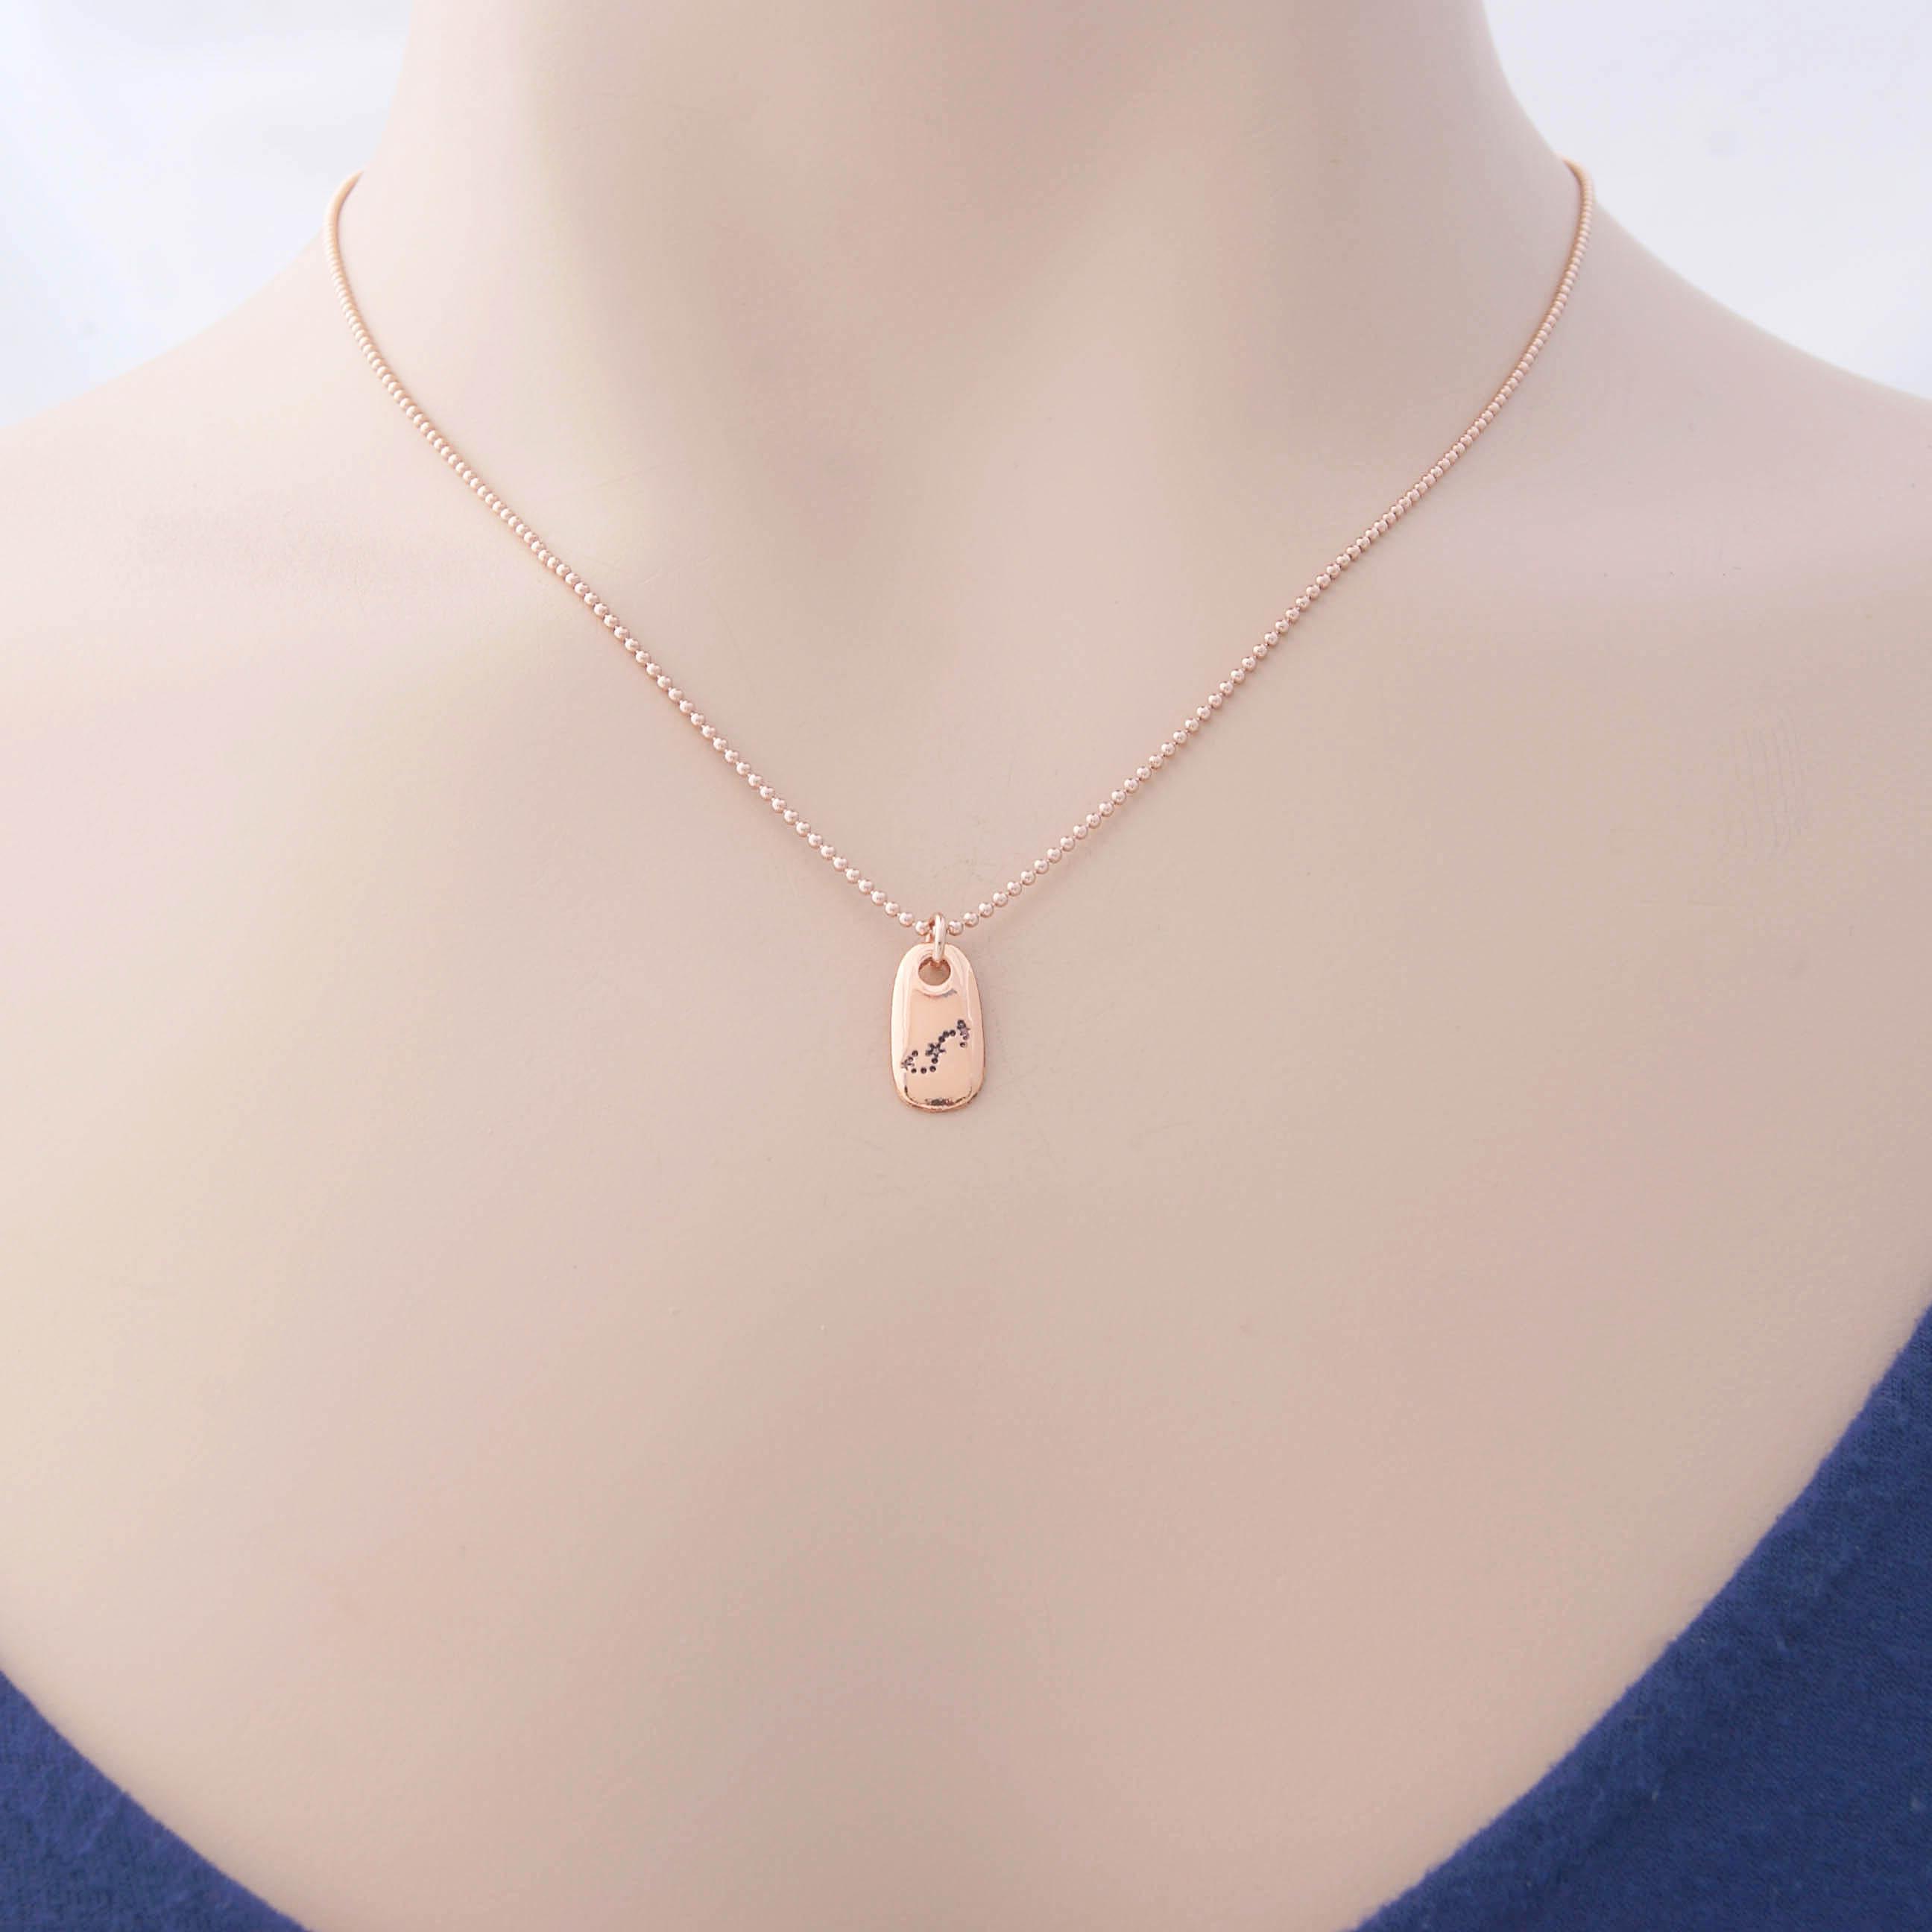 Scorpio Constellation Zodiac Necklace in Rose Gold